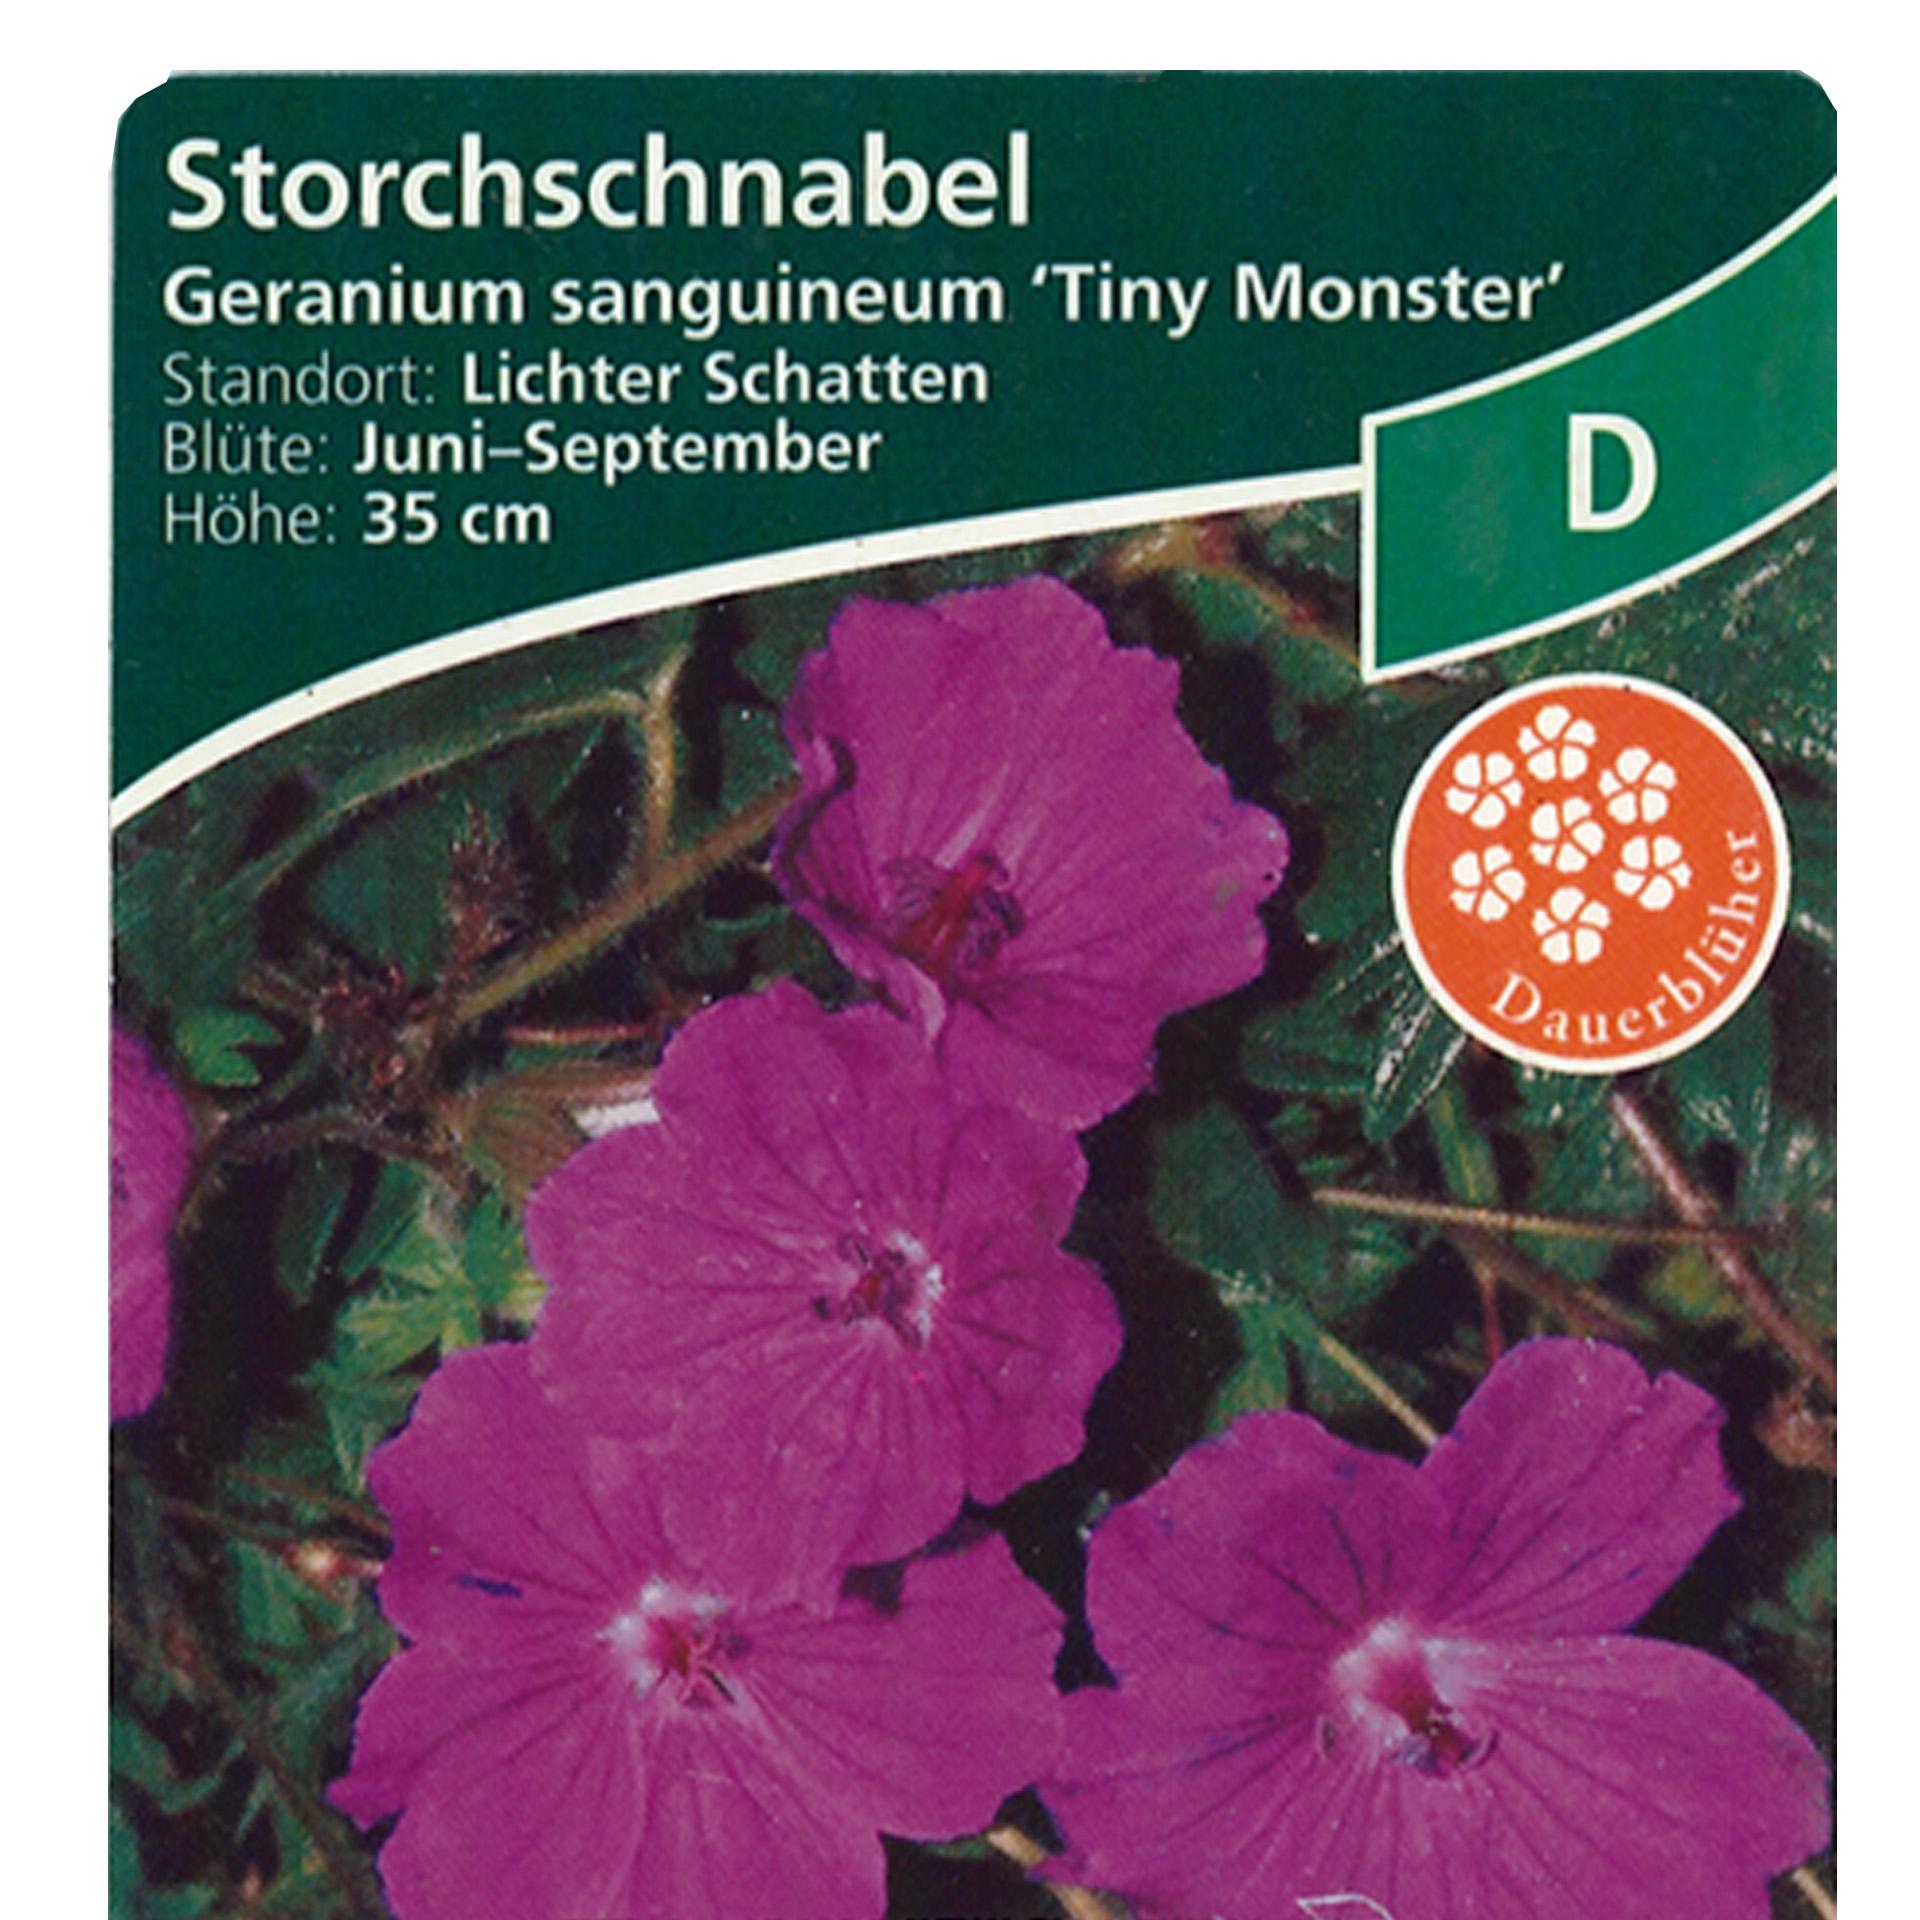 Blutroter Storchschnabel - Geranium sanguineum 'Tiny Monster', 9cm Topf